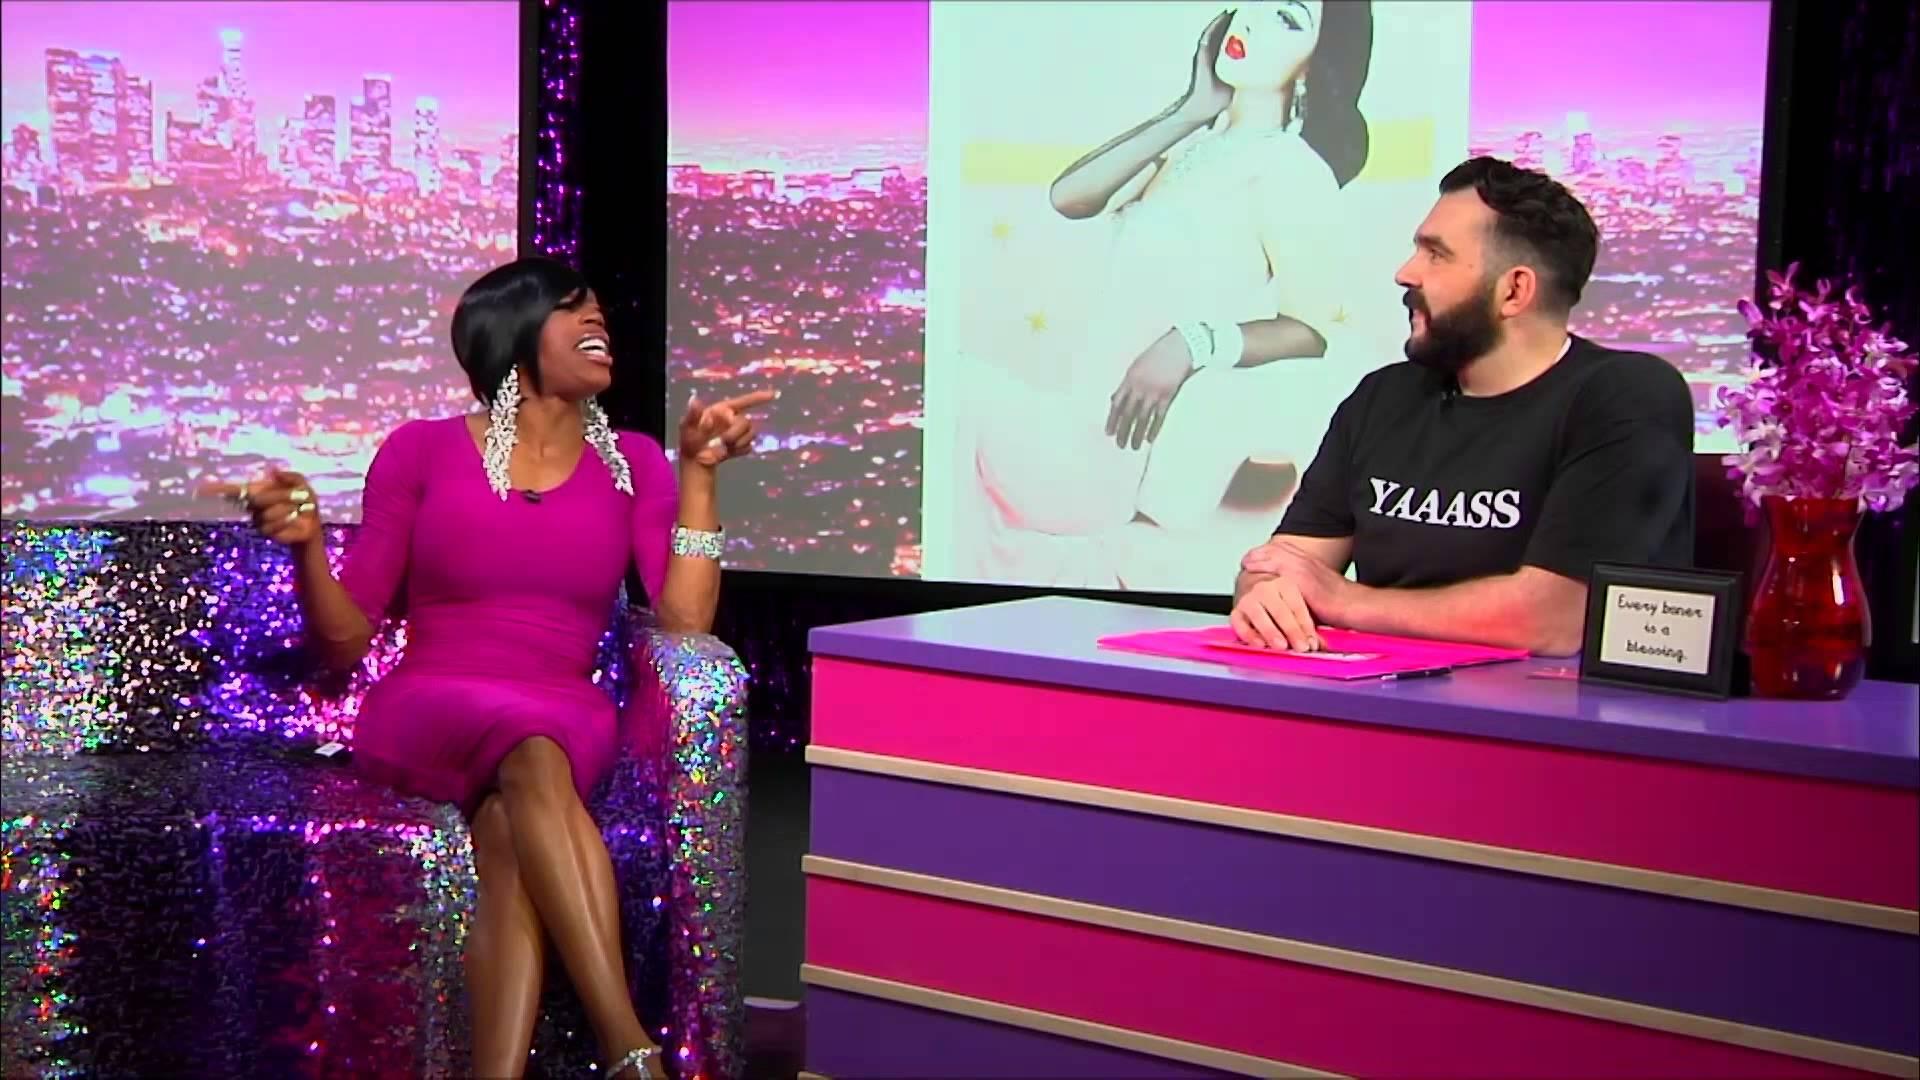 Jasmine Masters: Look at Huh on Hey Qween with Jonny McGovern